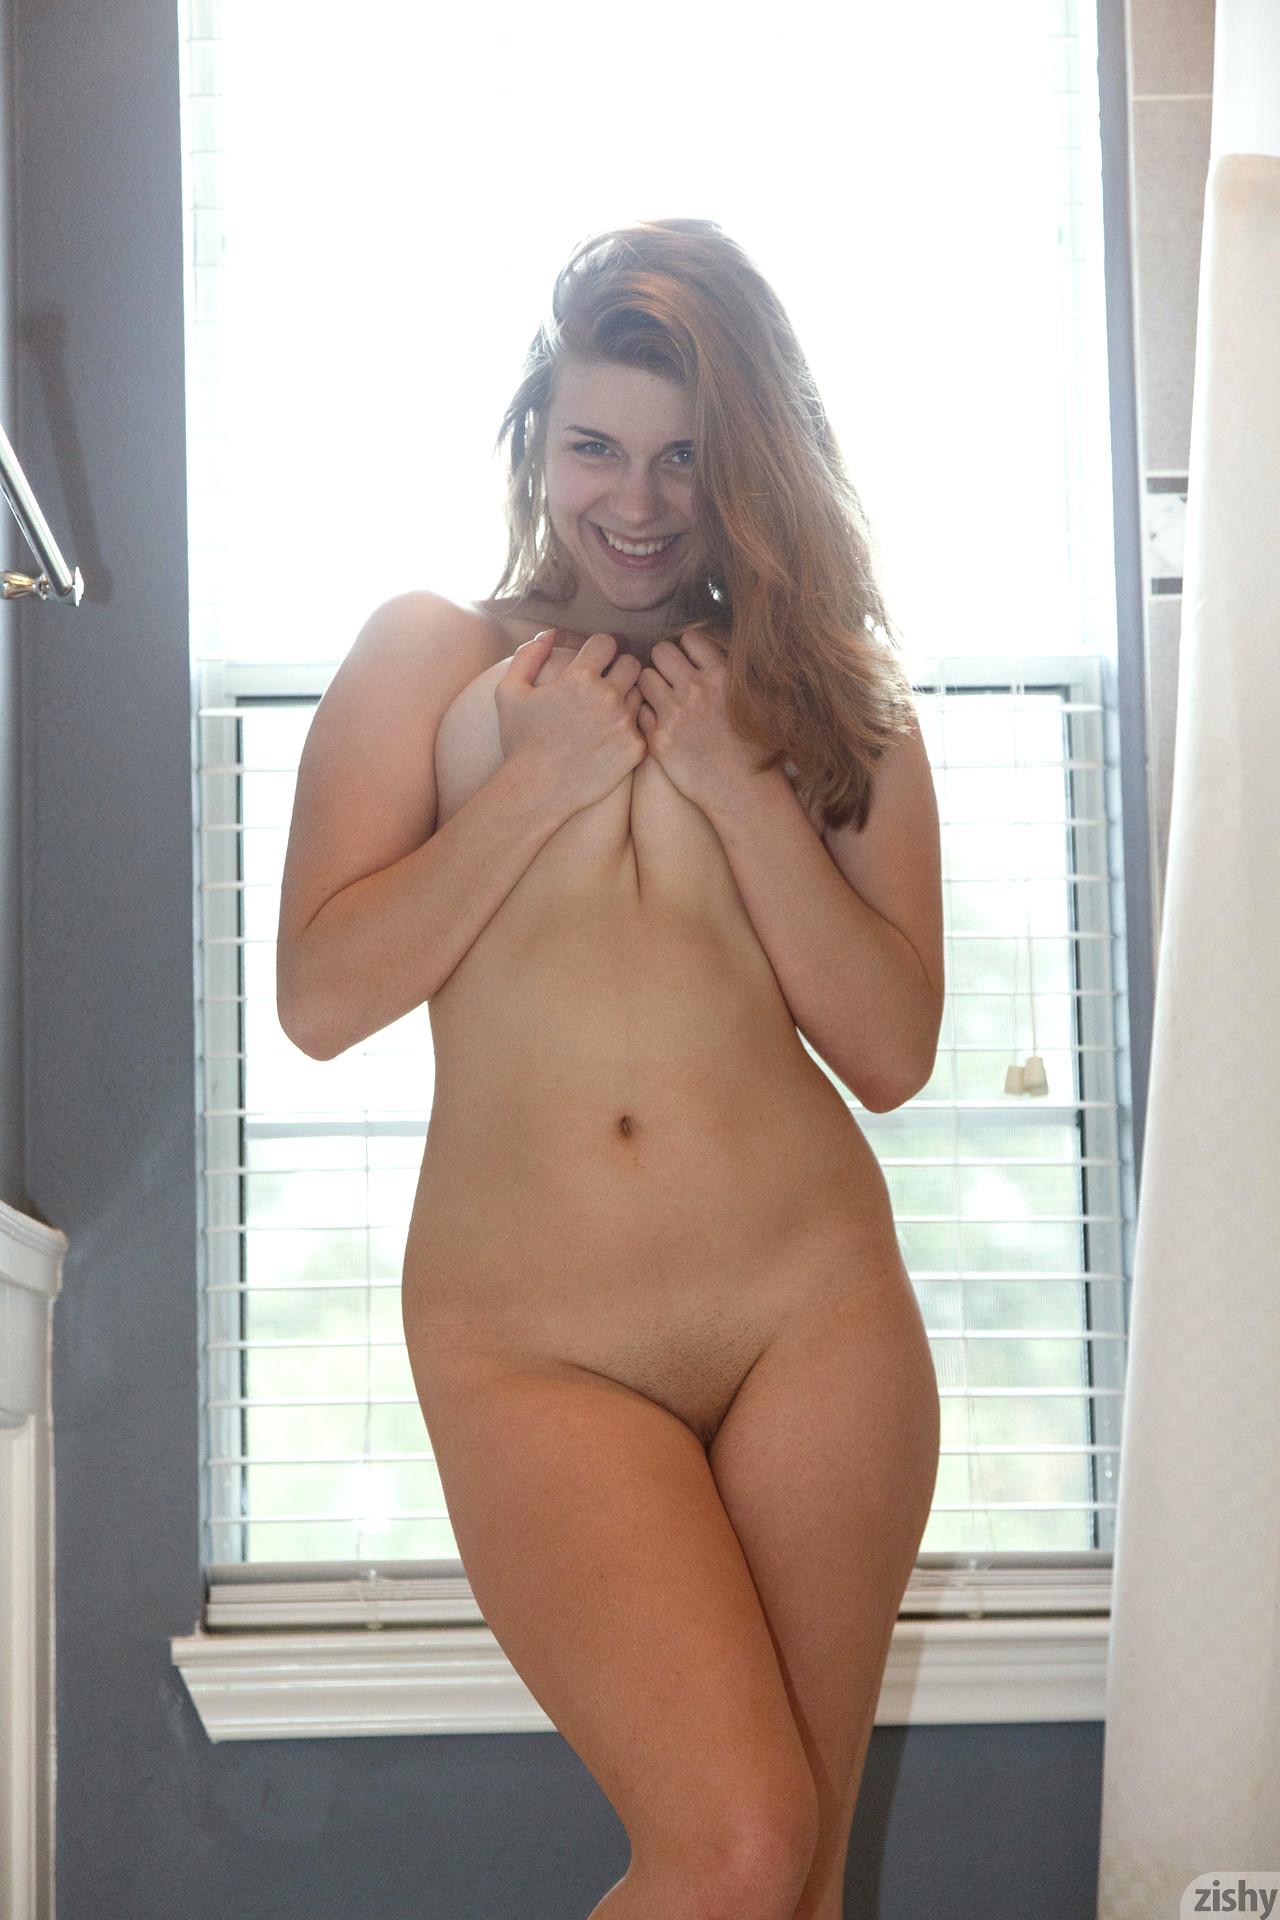 Nude met art spreading labia